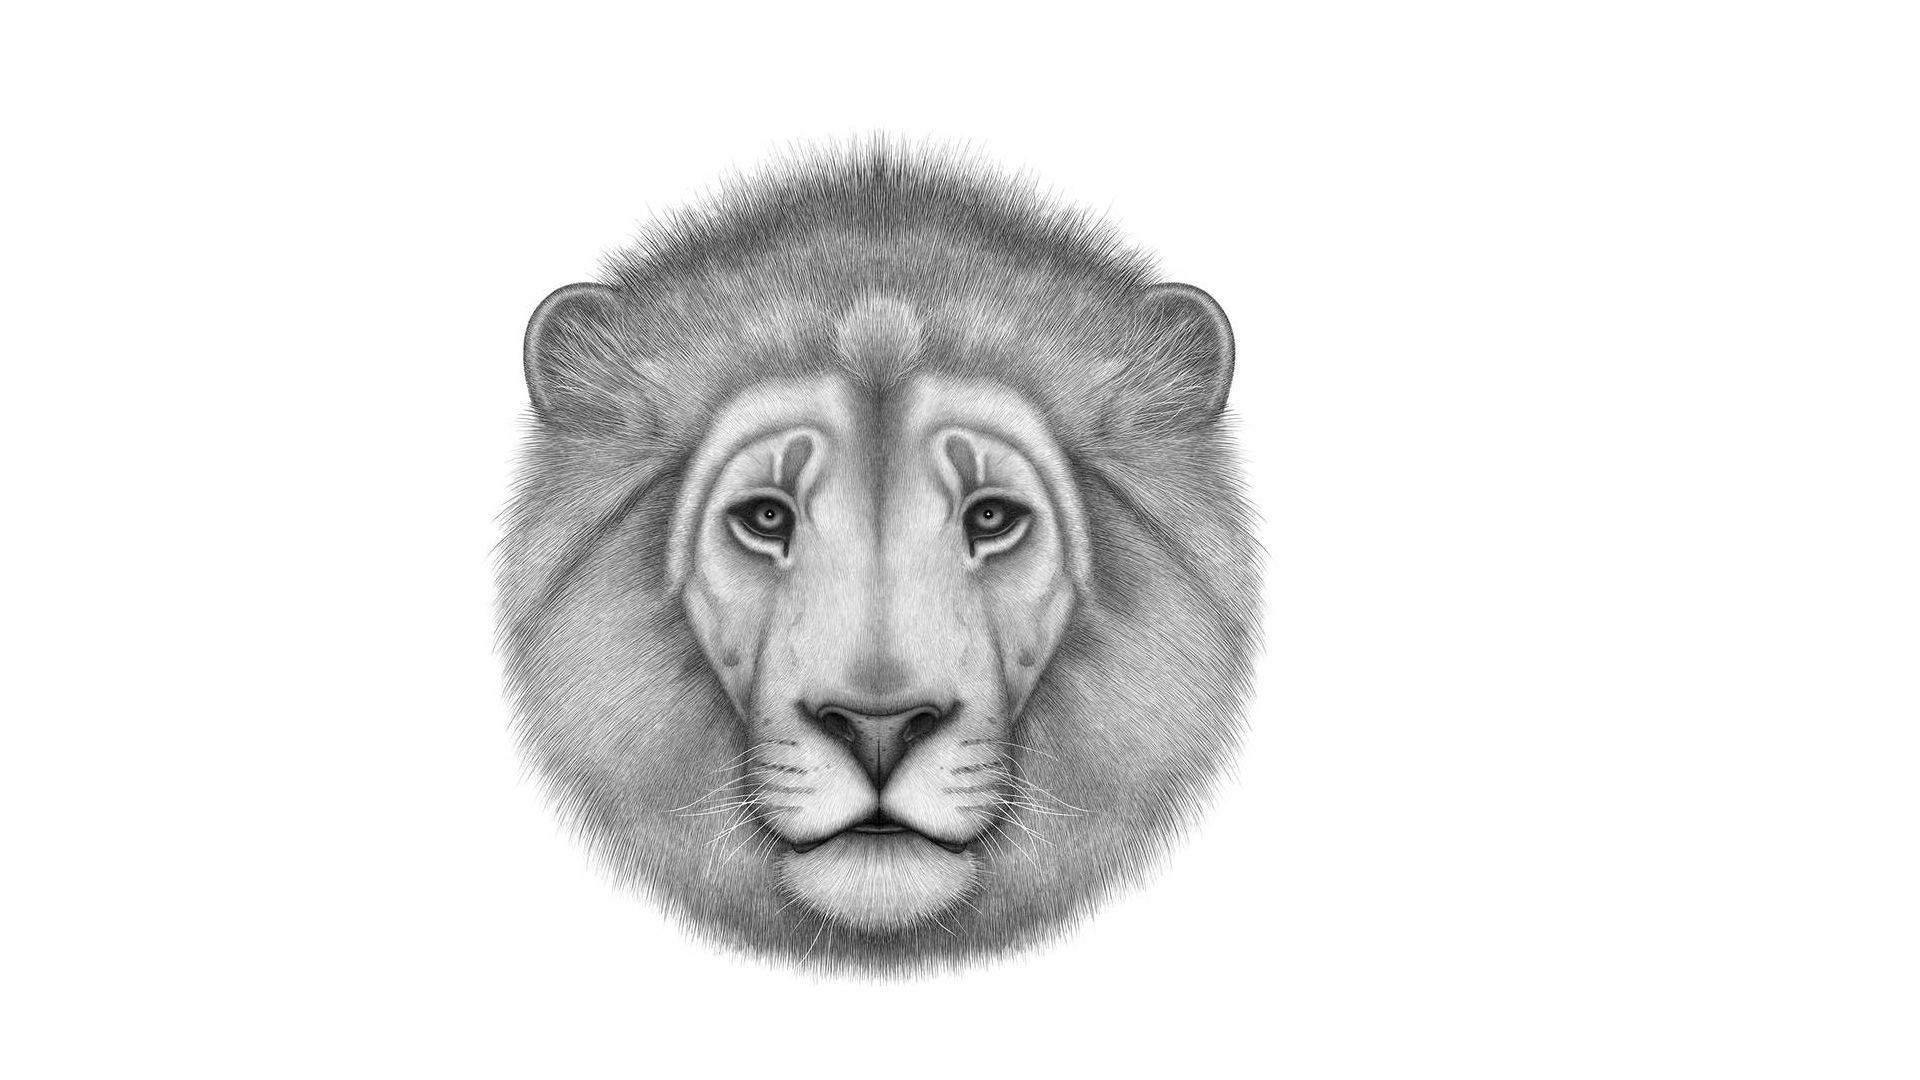 Lion Black And White Animal Wallpaper Image